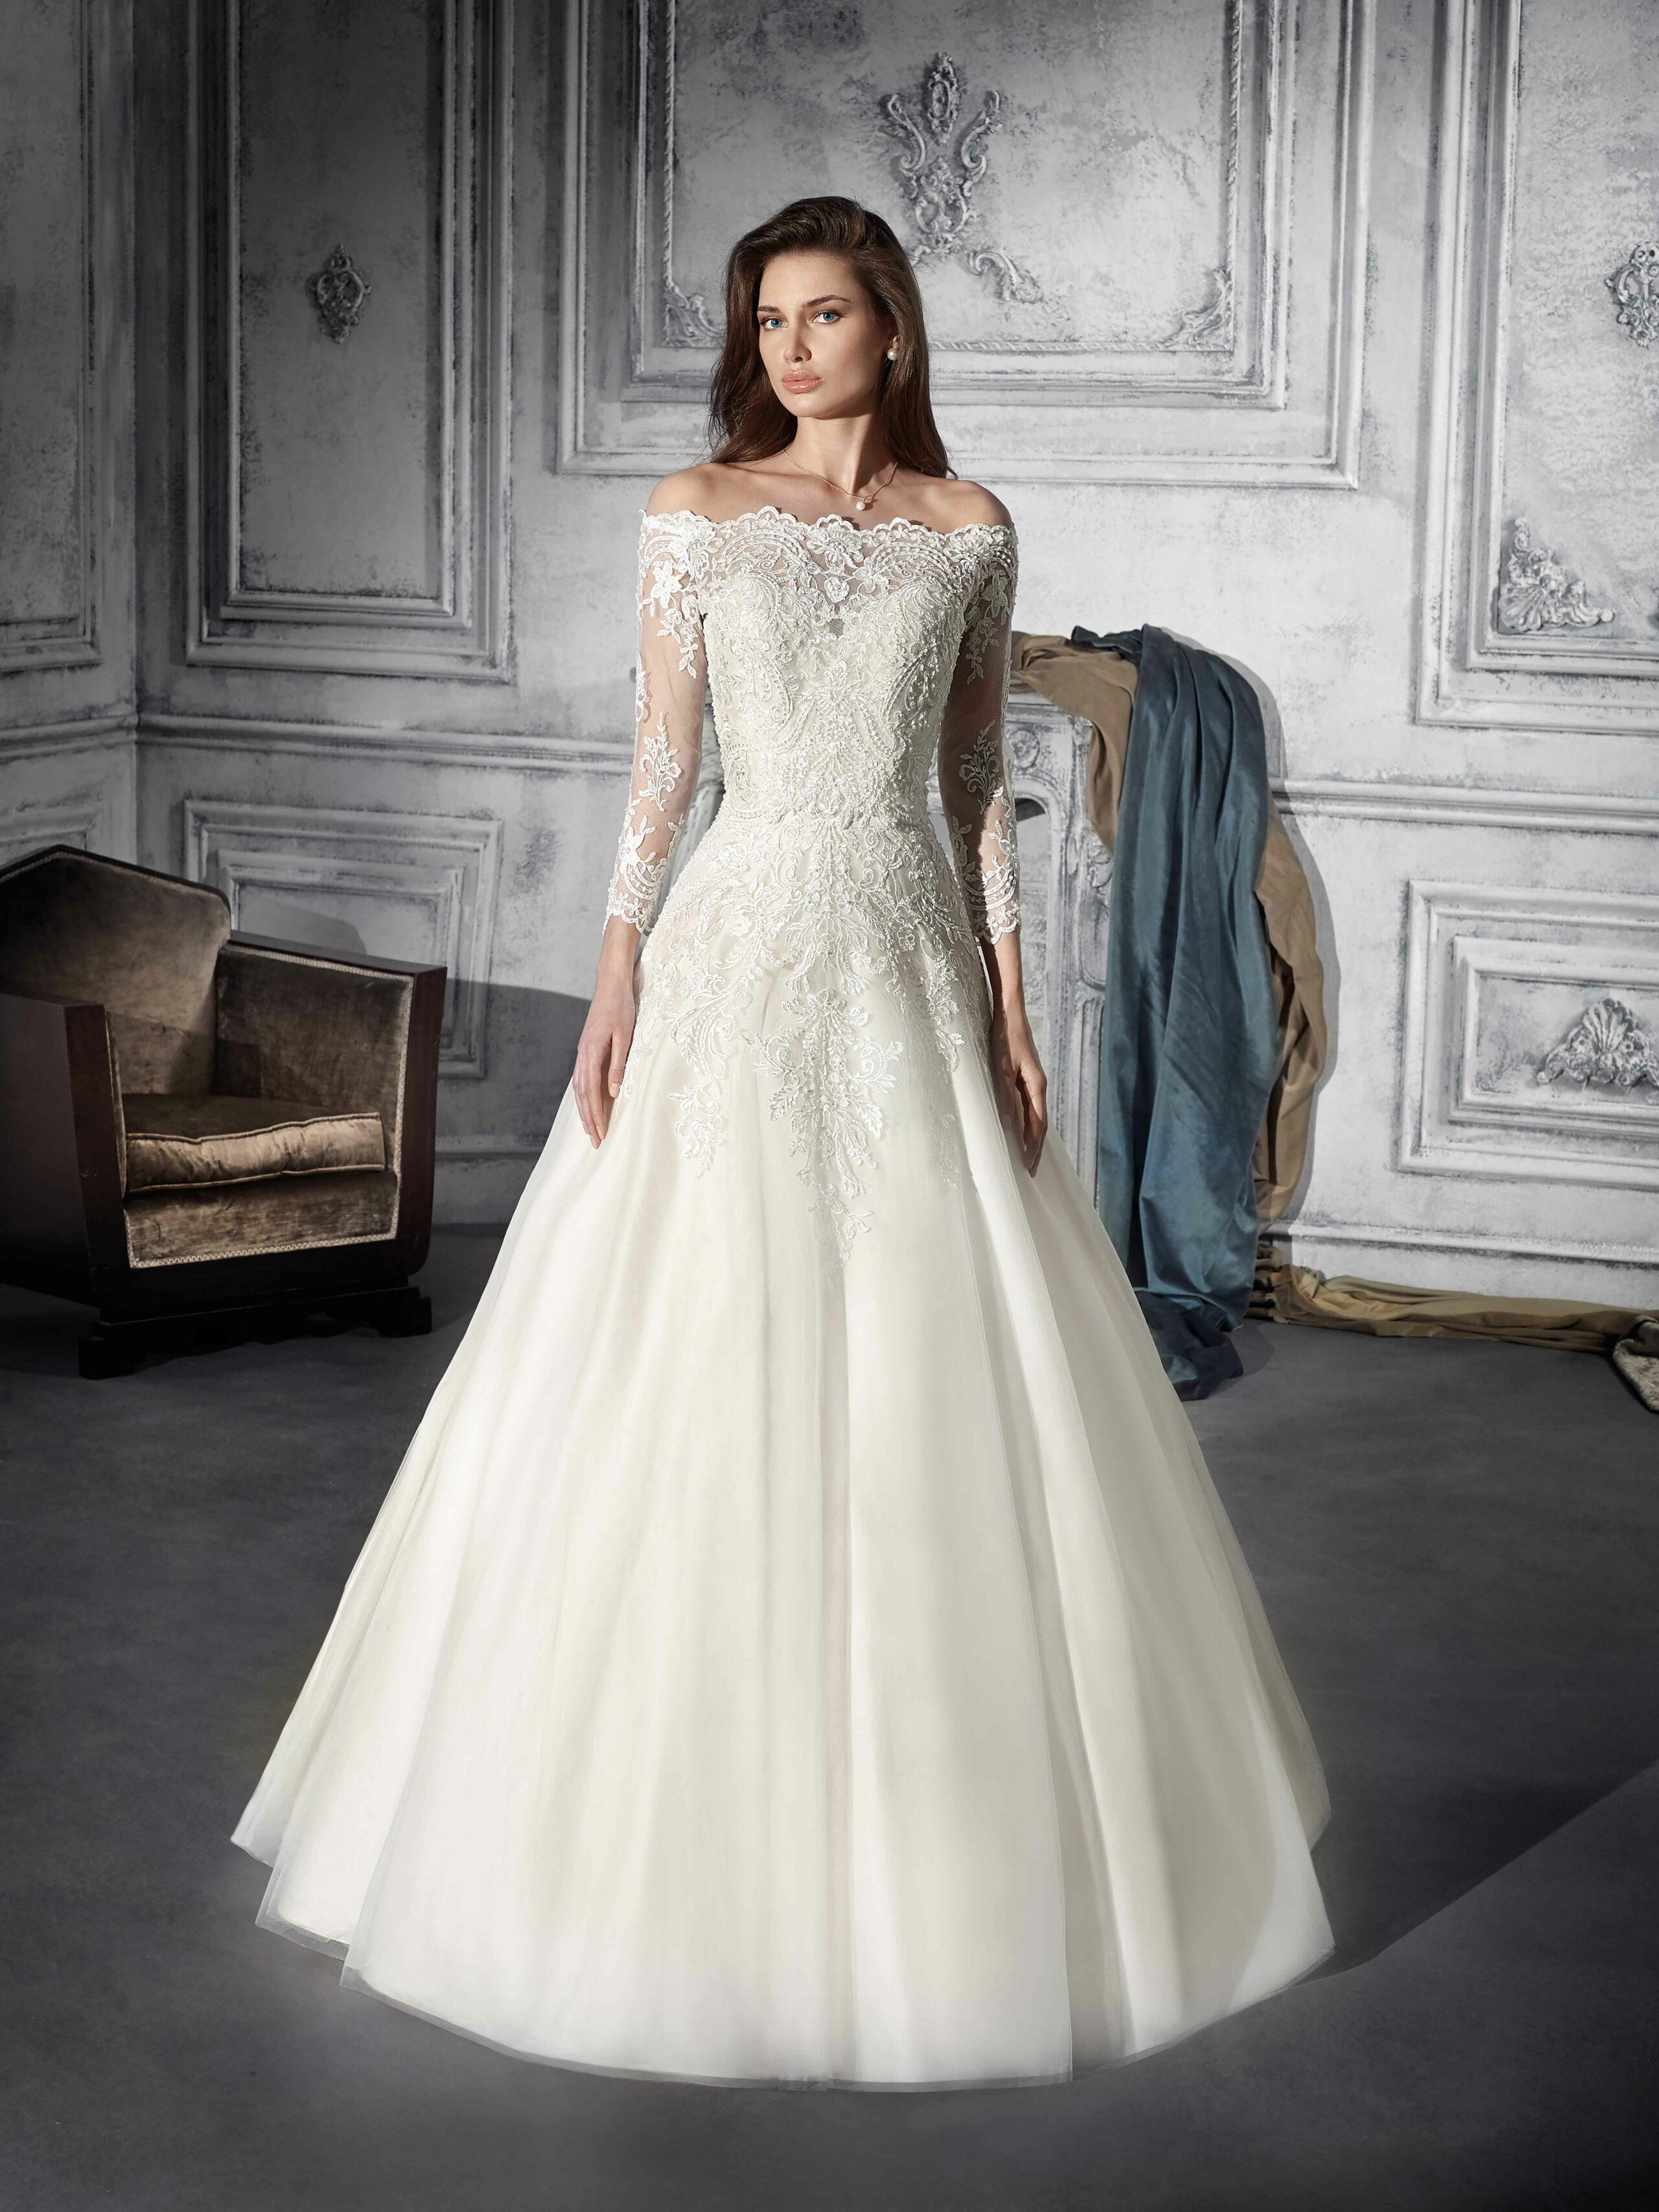 Demetrios 734 lyne mariage cannes 06 for Meilleurs magasins de robe de mariage